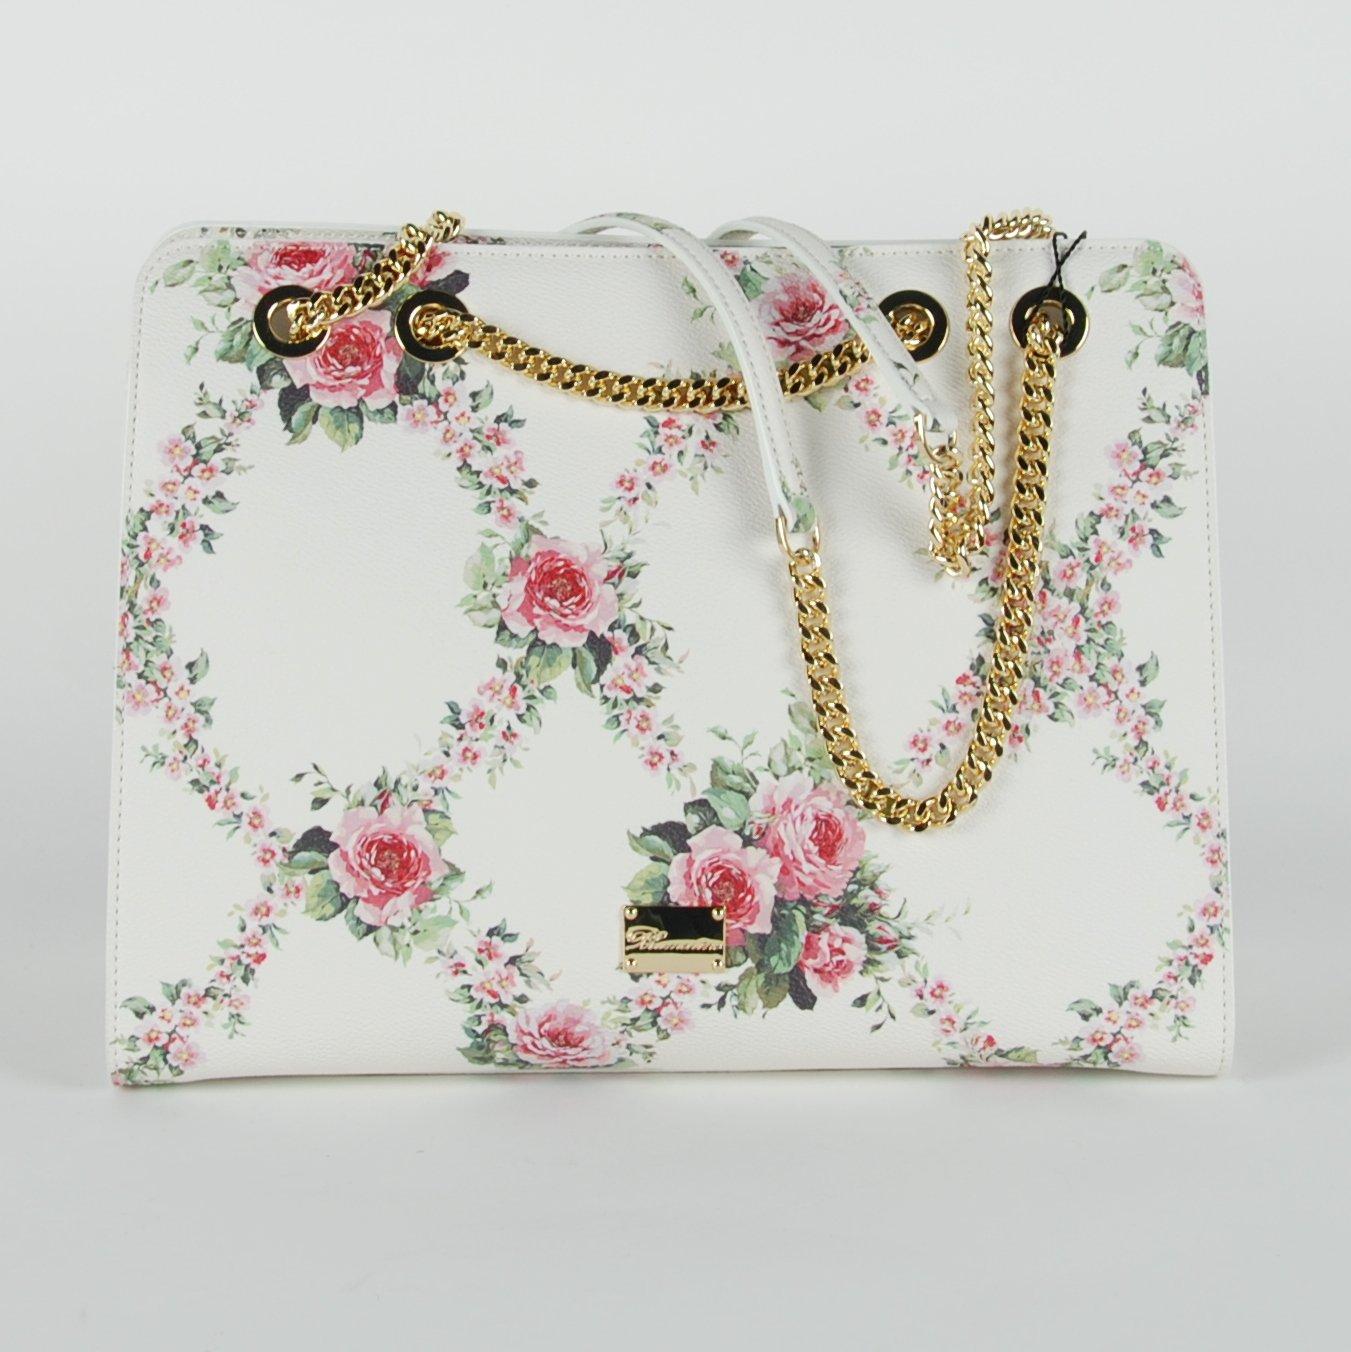 Blumarine Women's Shopping Bag Multicolor BL1421437